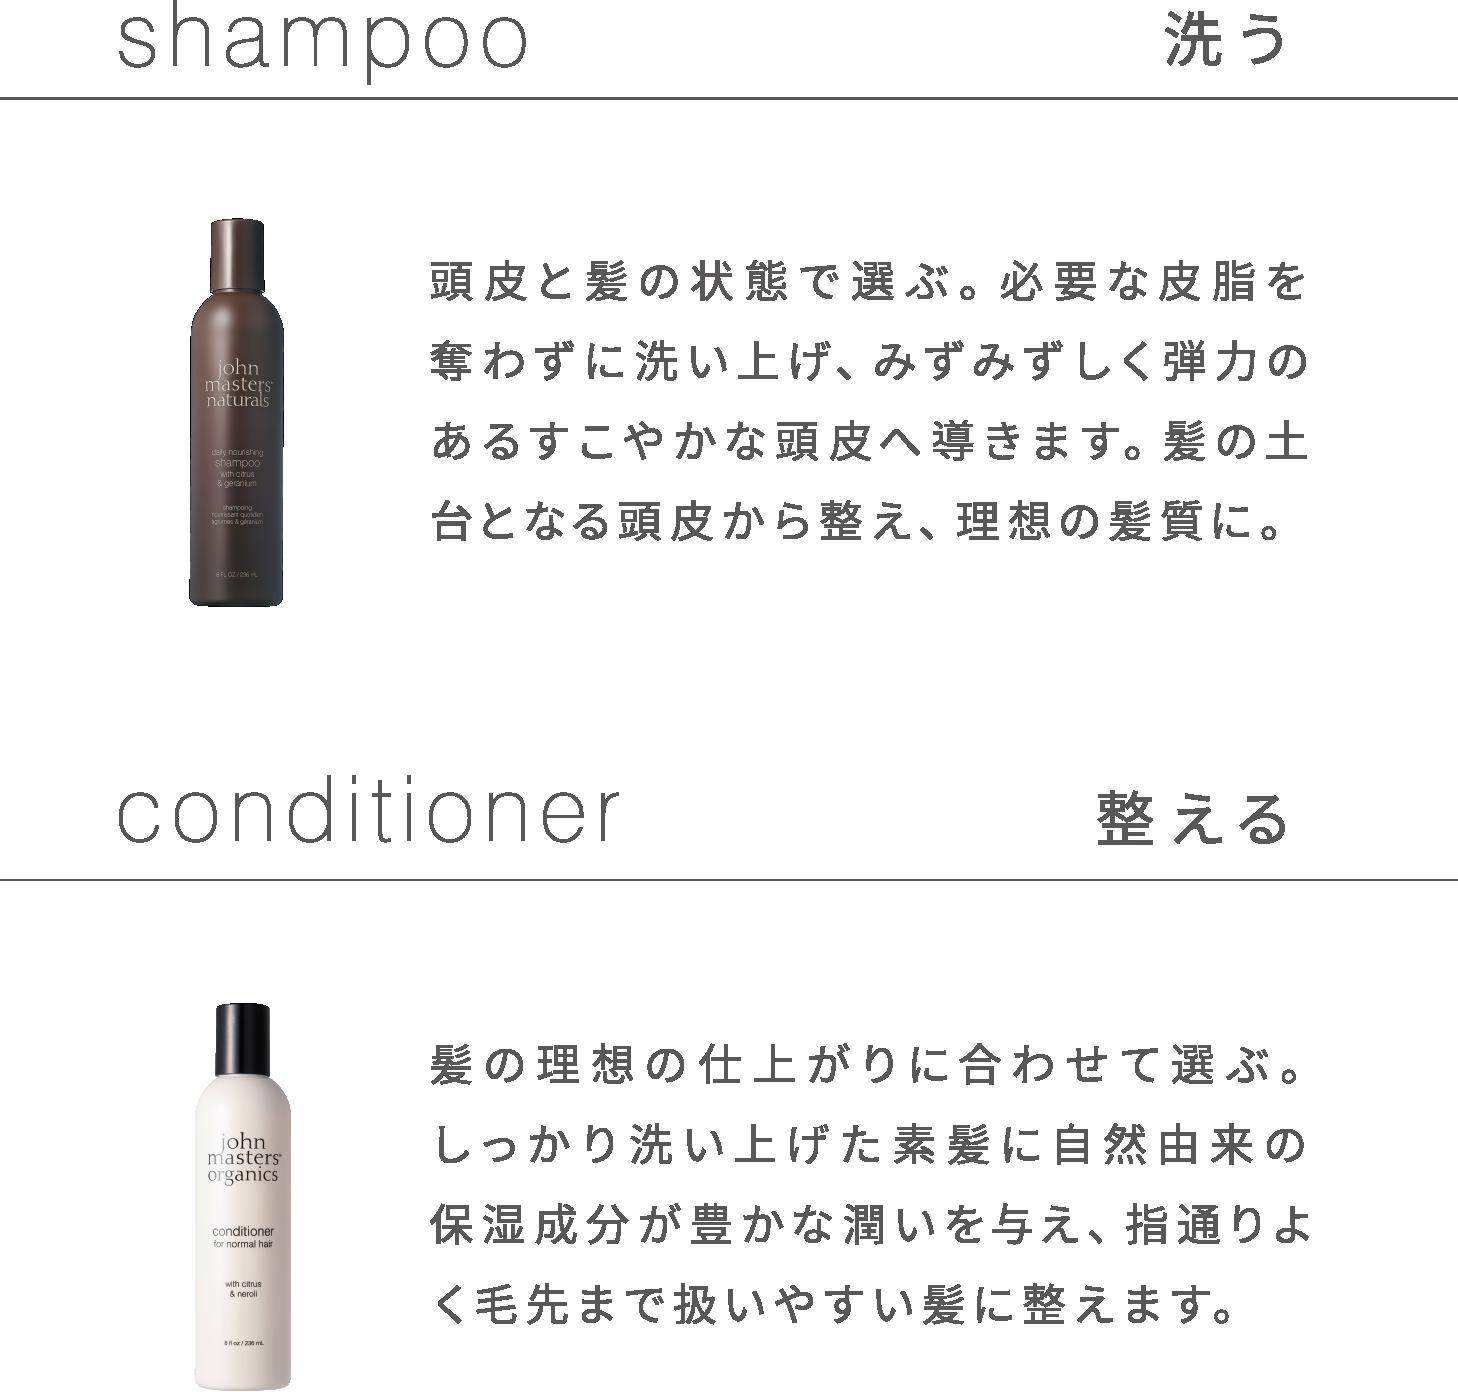 shampoo conditioner